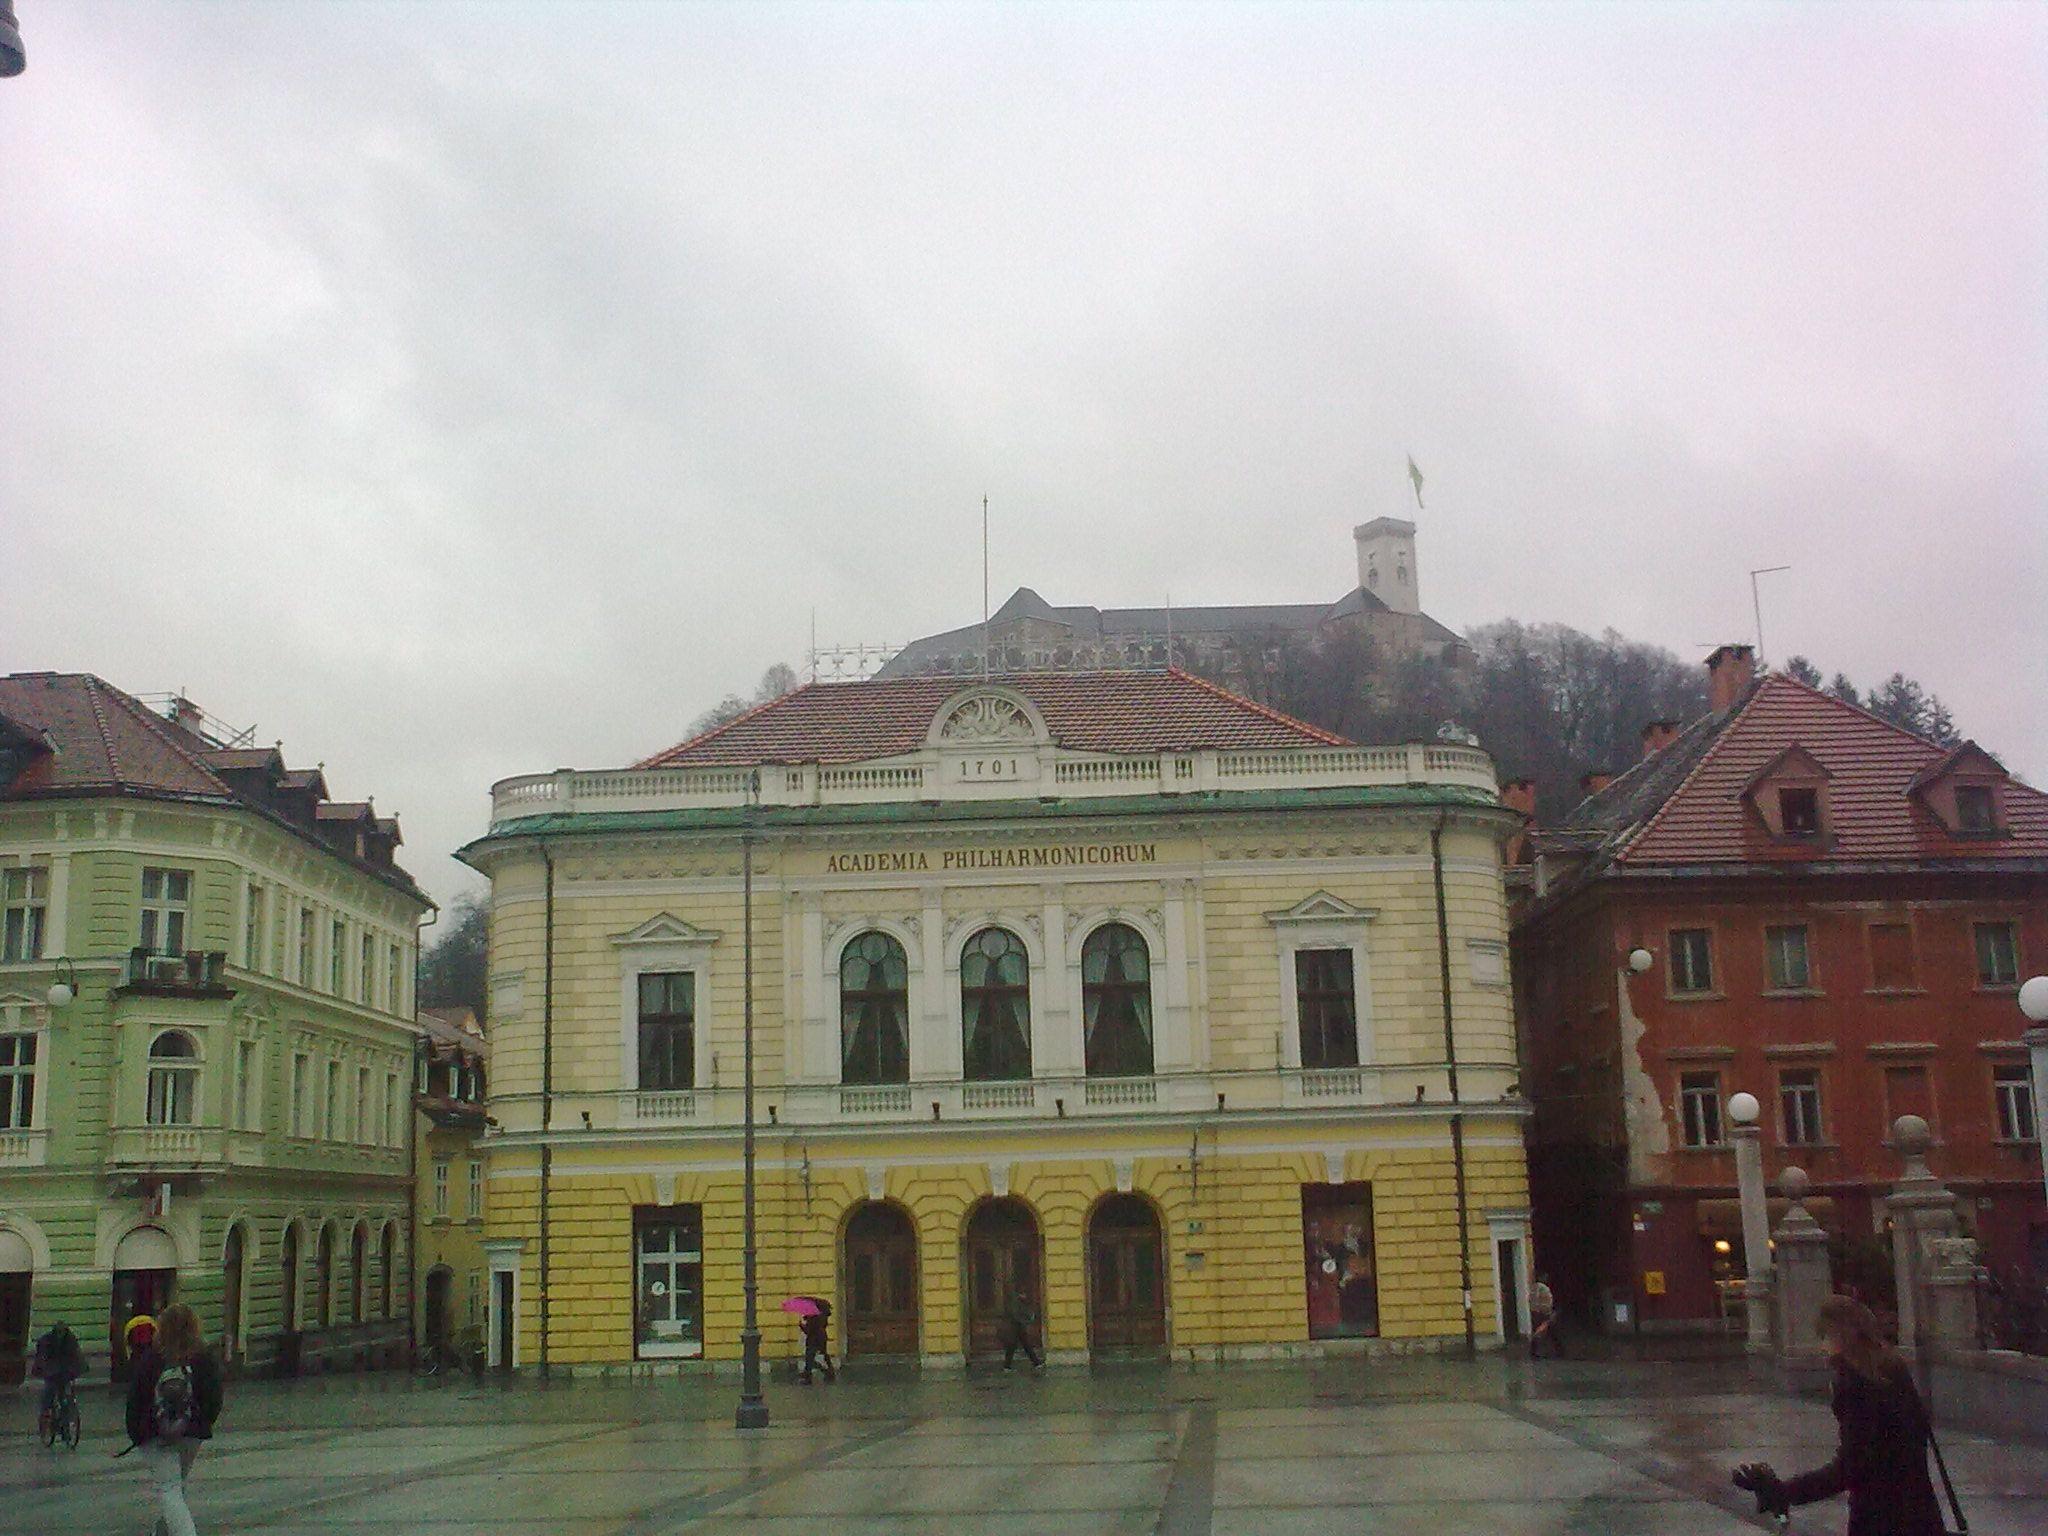 Az Academia Philharmonicorum